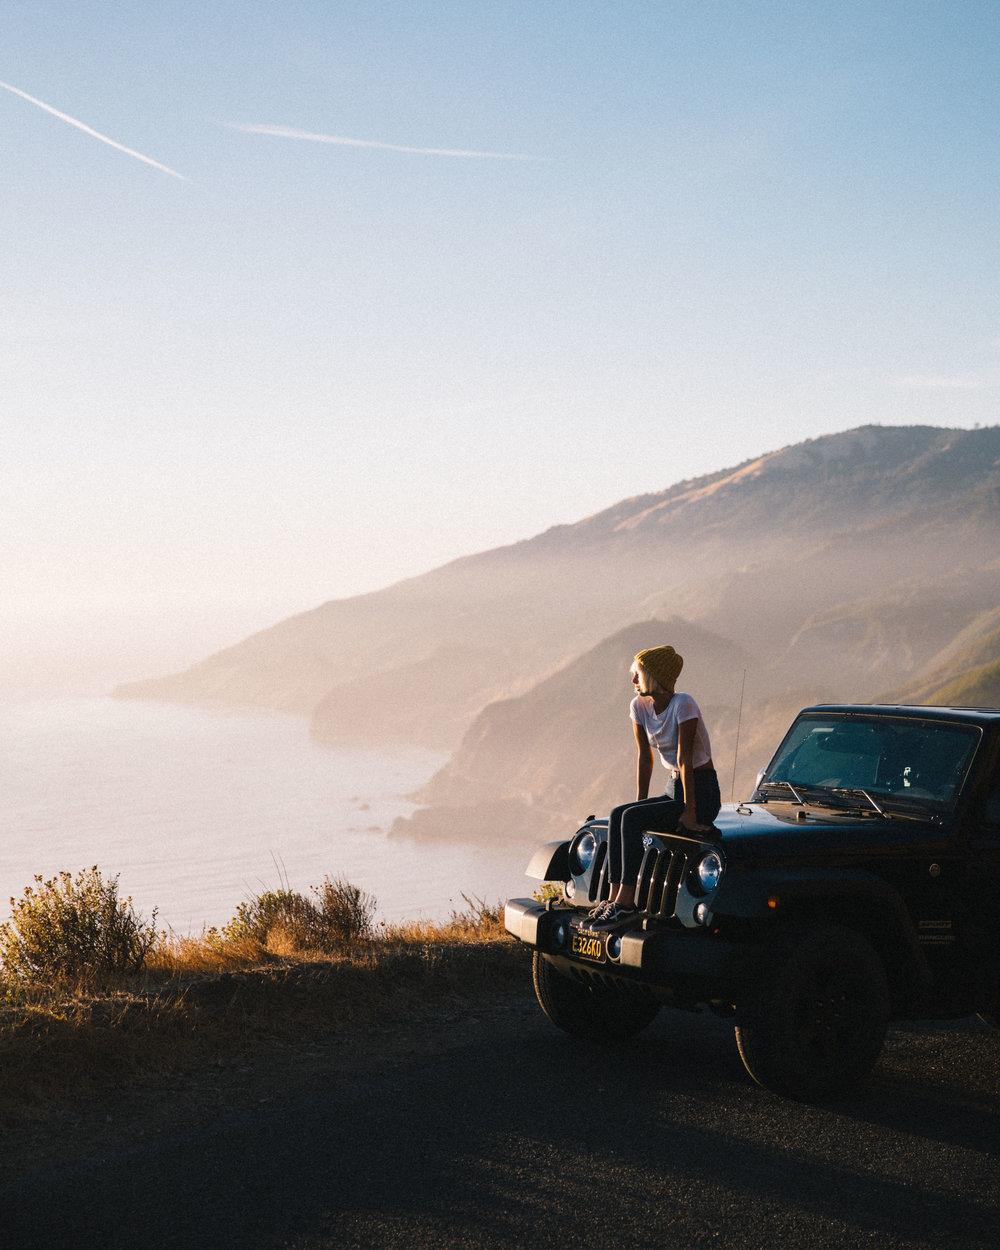 Grant-Puckett-Adventure-Lifestyle.jpg